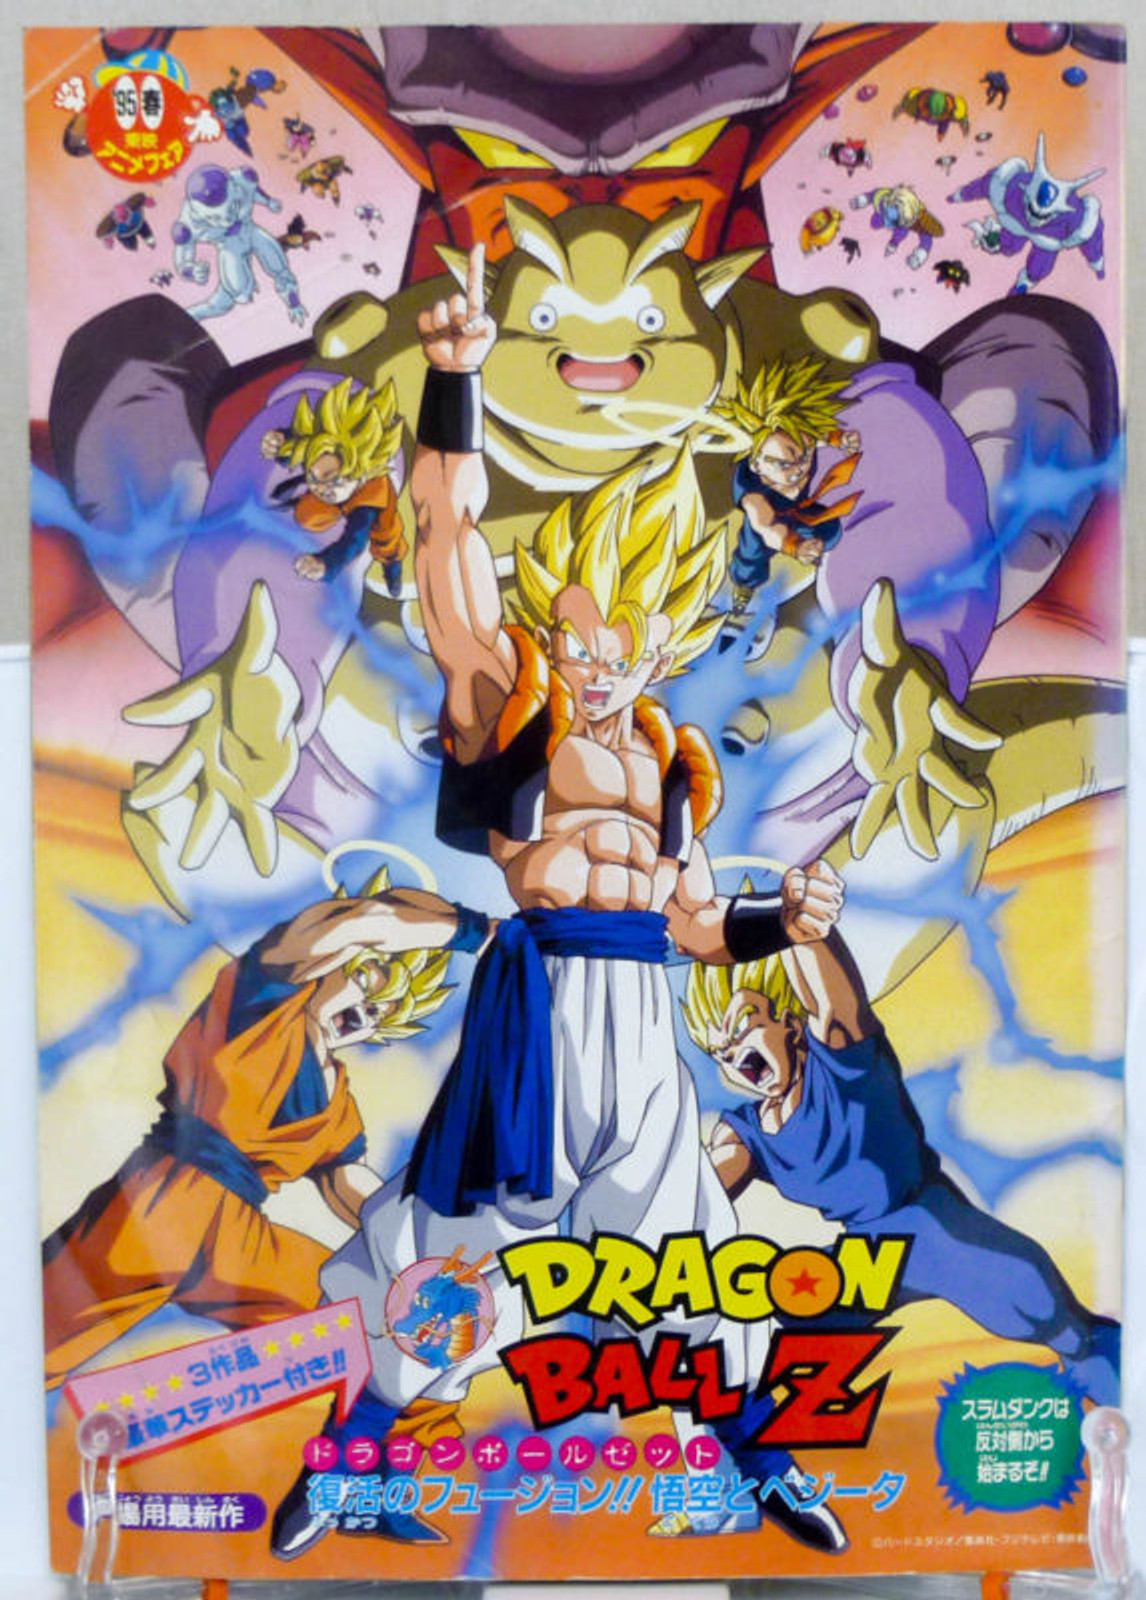 Dragon Ball Z Slum Dunk Movie  Program Art Book 1995 JAPAN ANIME MANGA